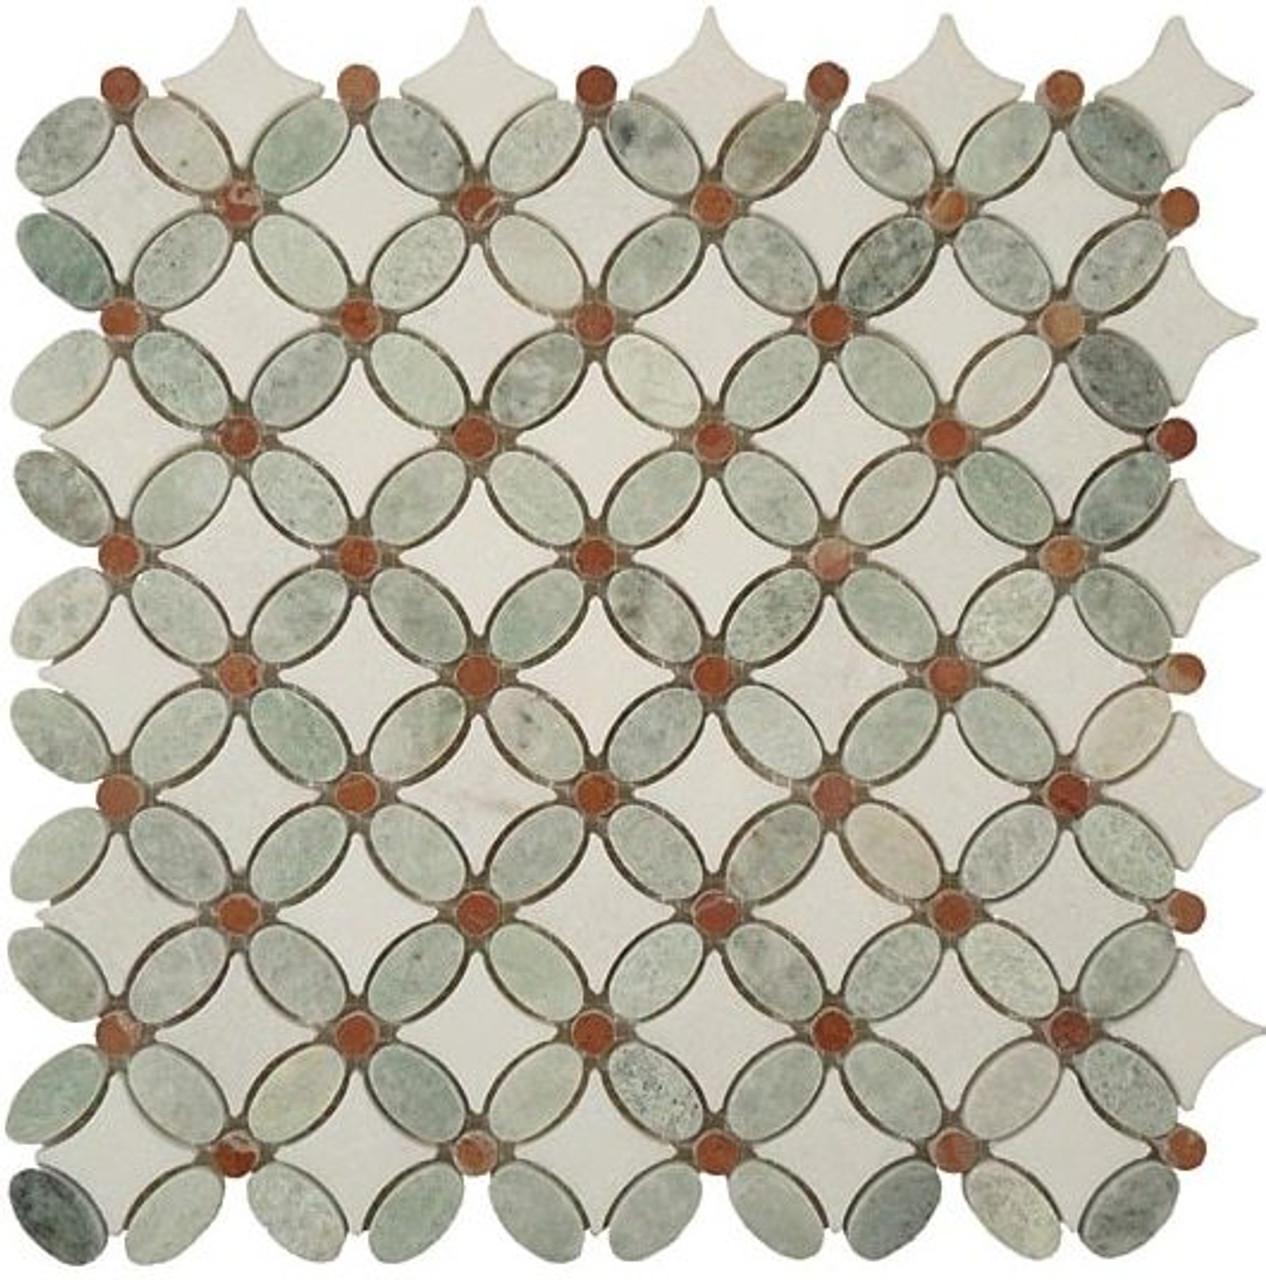 Bella Glass Tiles Flower Series FS-72 marble mosaic tile